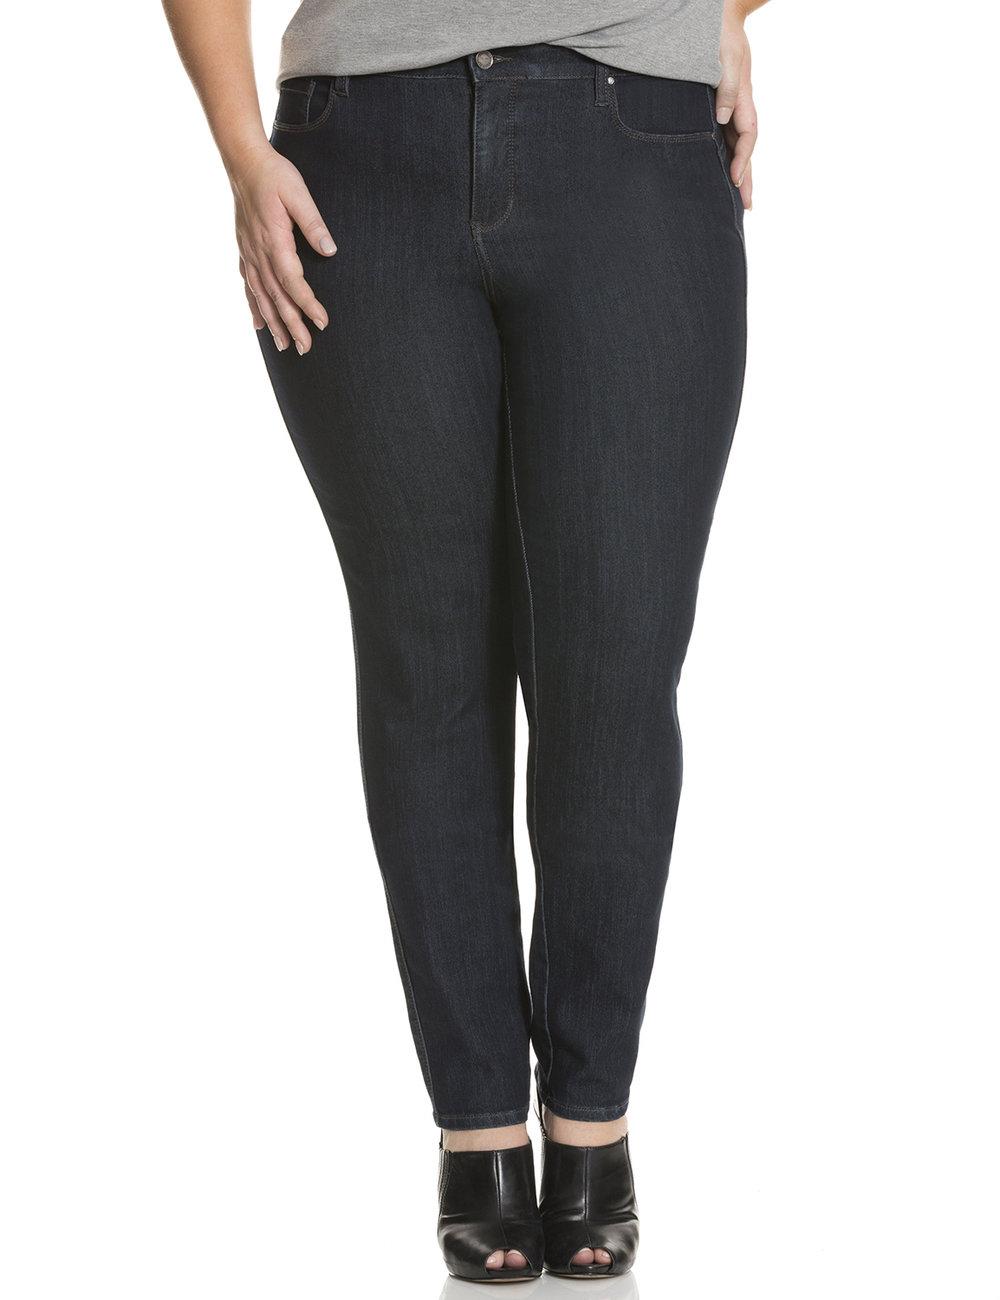 retouched dark denim straight leg jeans on model for ecommerce site